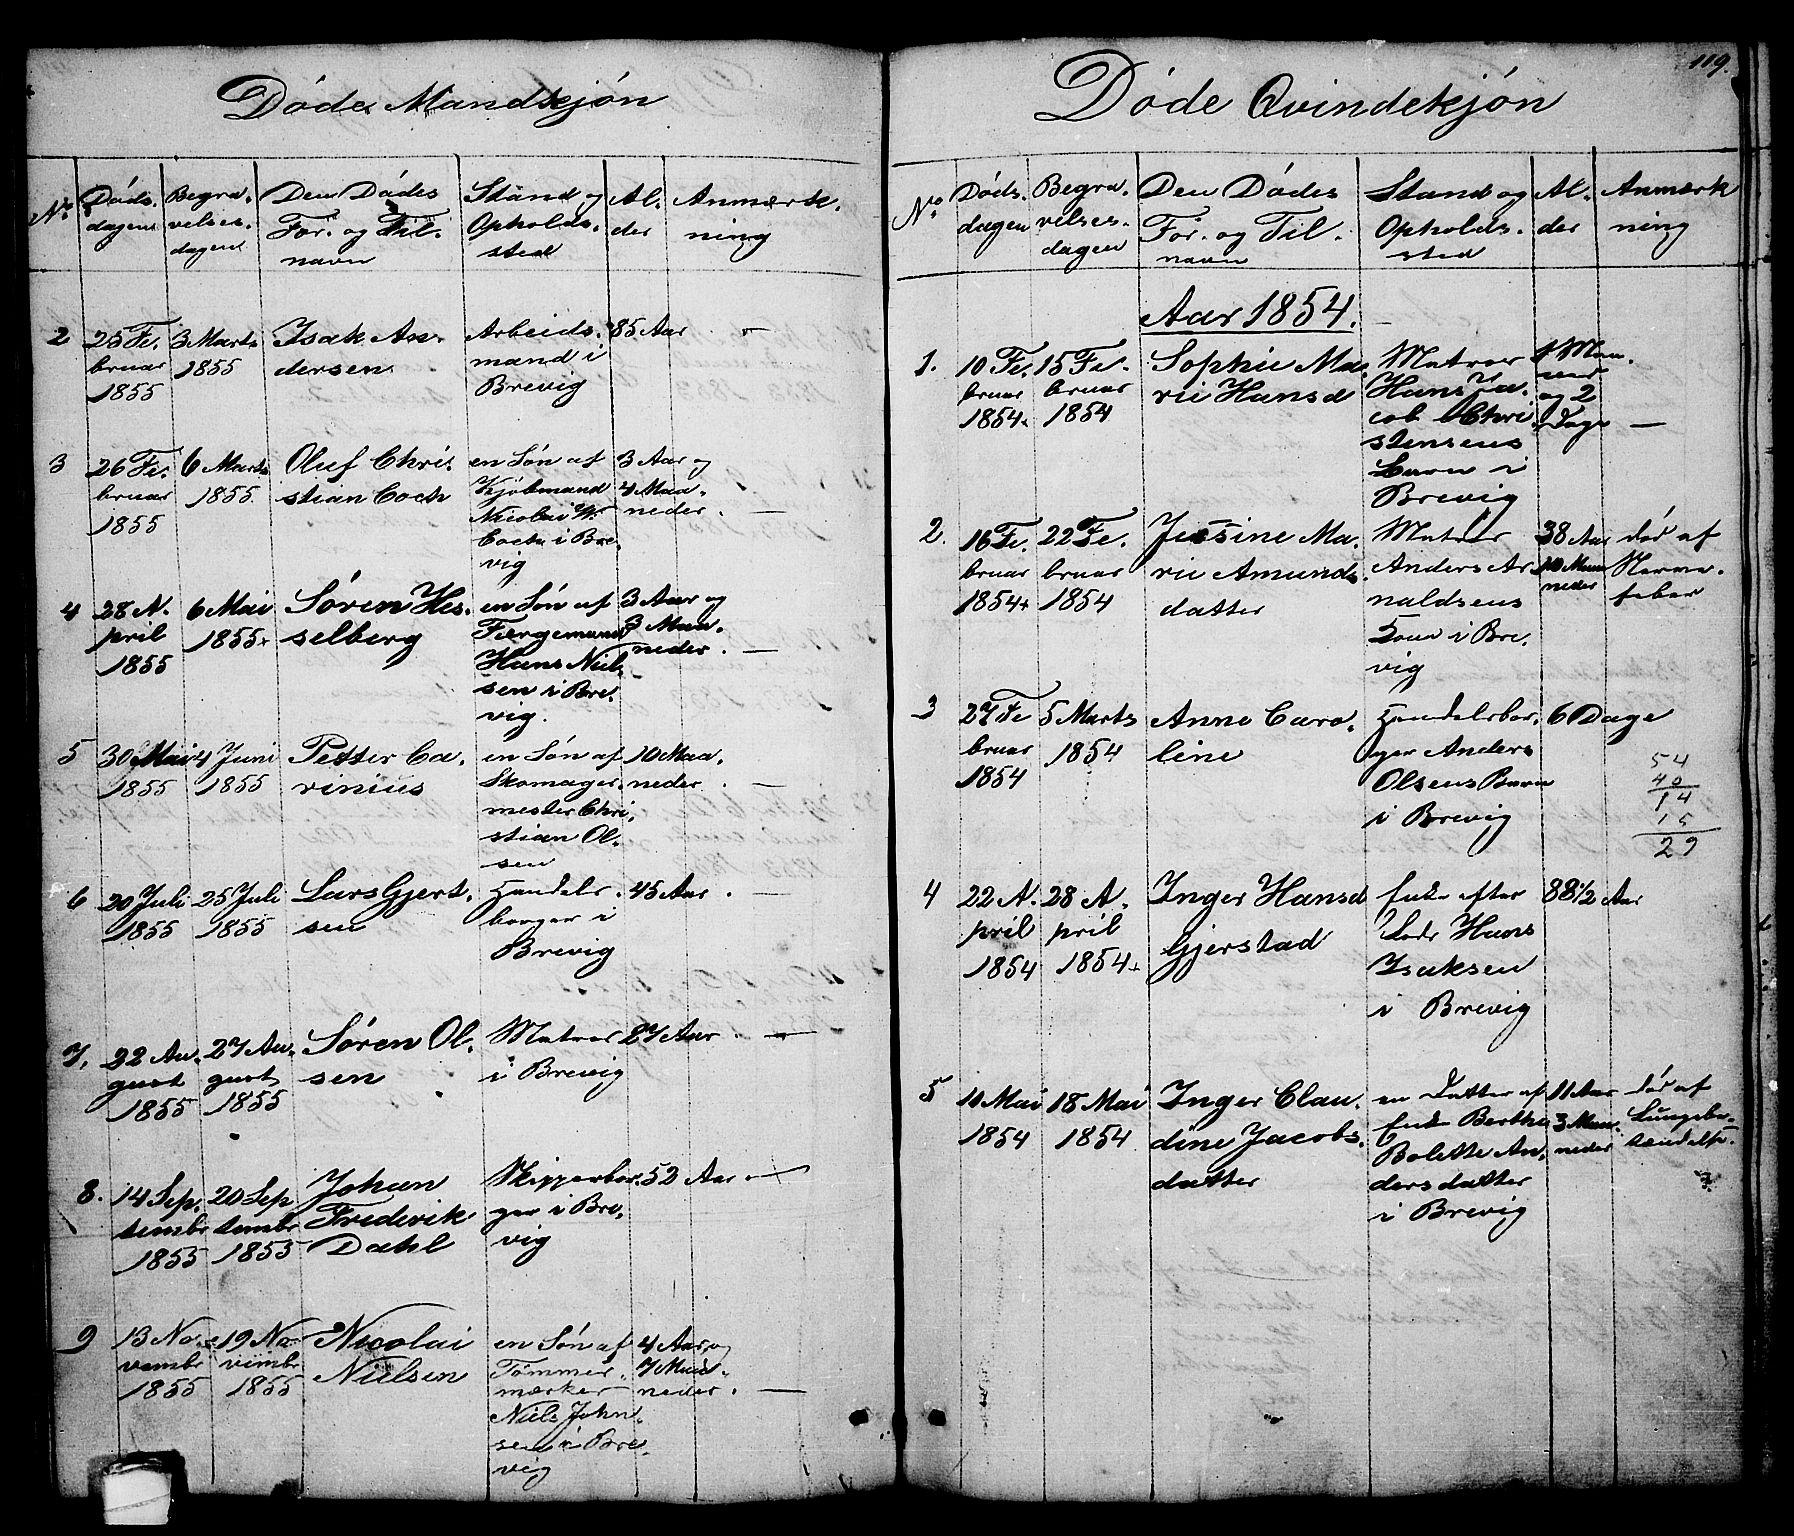 SAKO, Brevik kirkebøker, G/Ga/L0002: Klokkerbok nr. 2, 1846-1865, s. 119